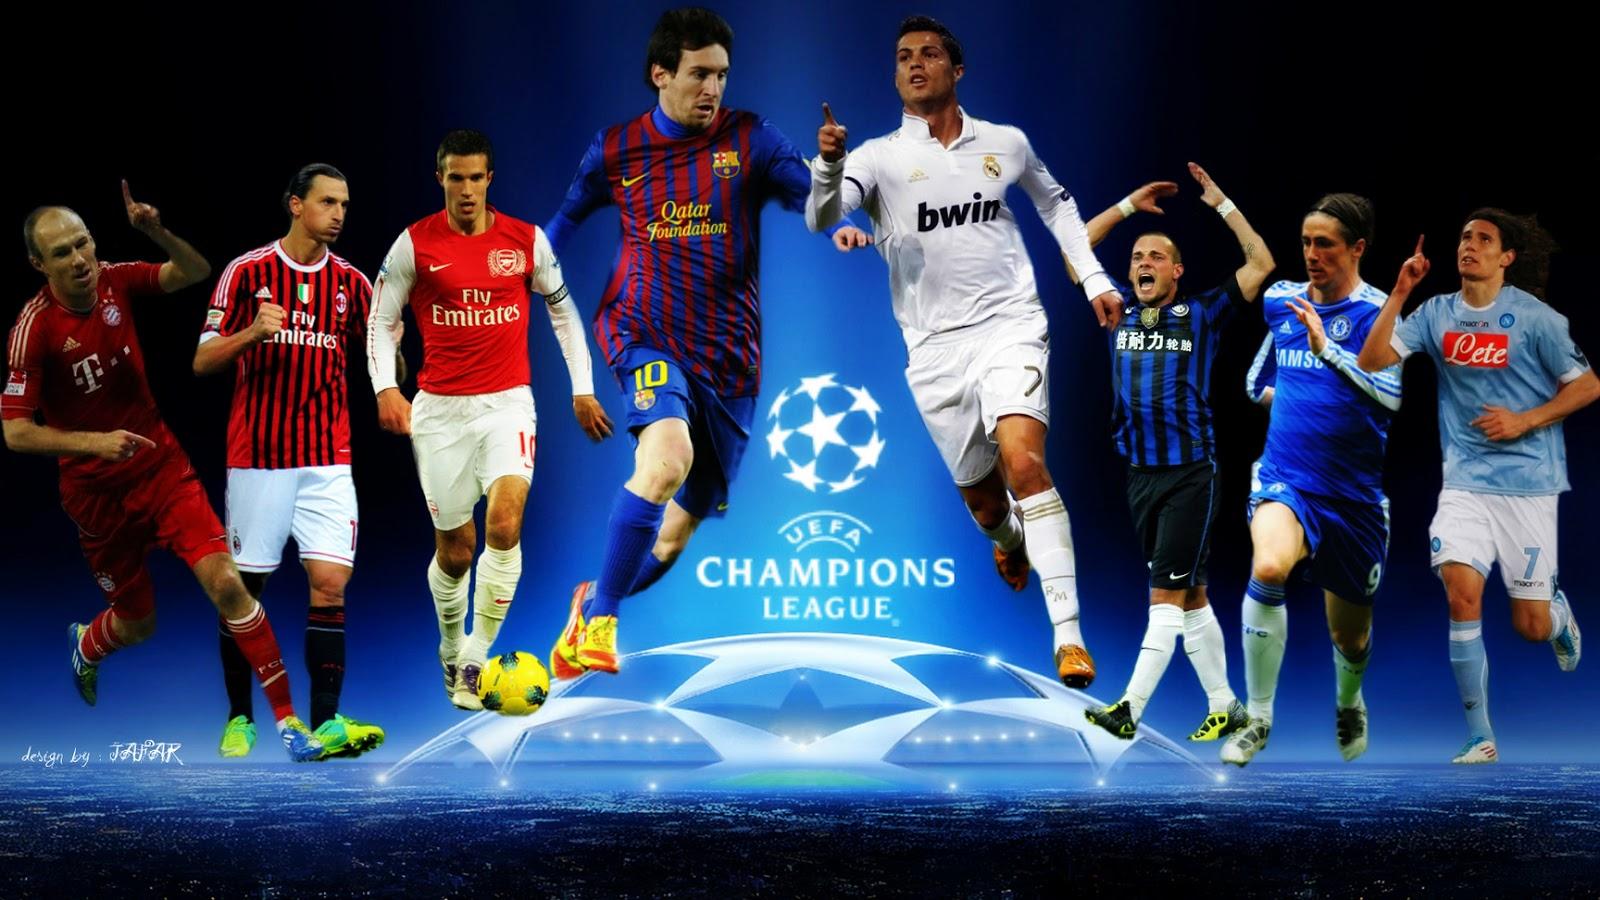 champions league wallpaper hd 1280x800 download this wallpaper 1600x900